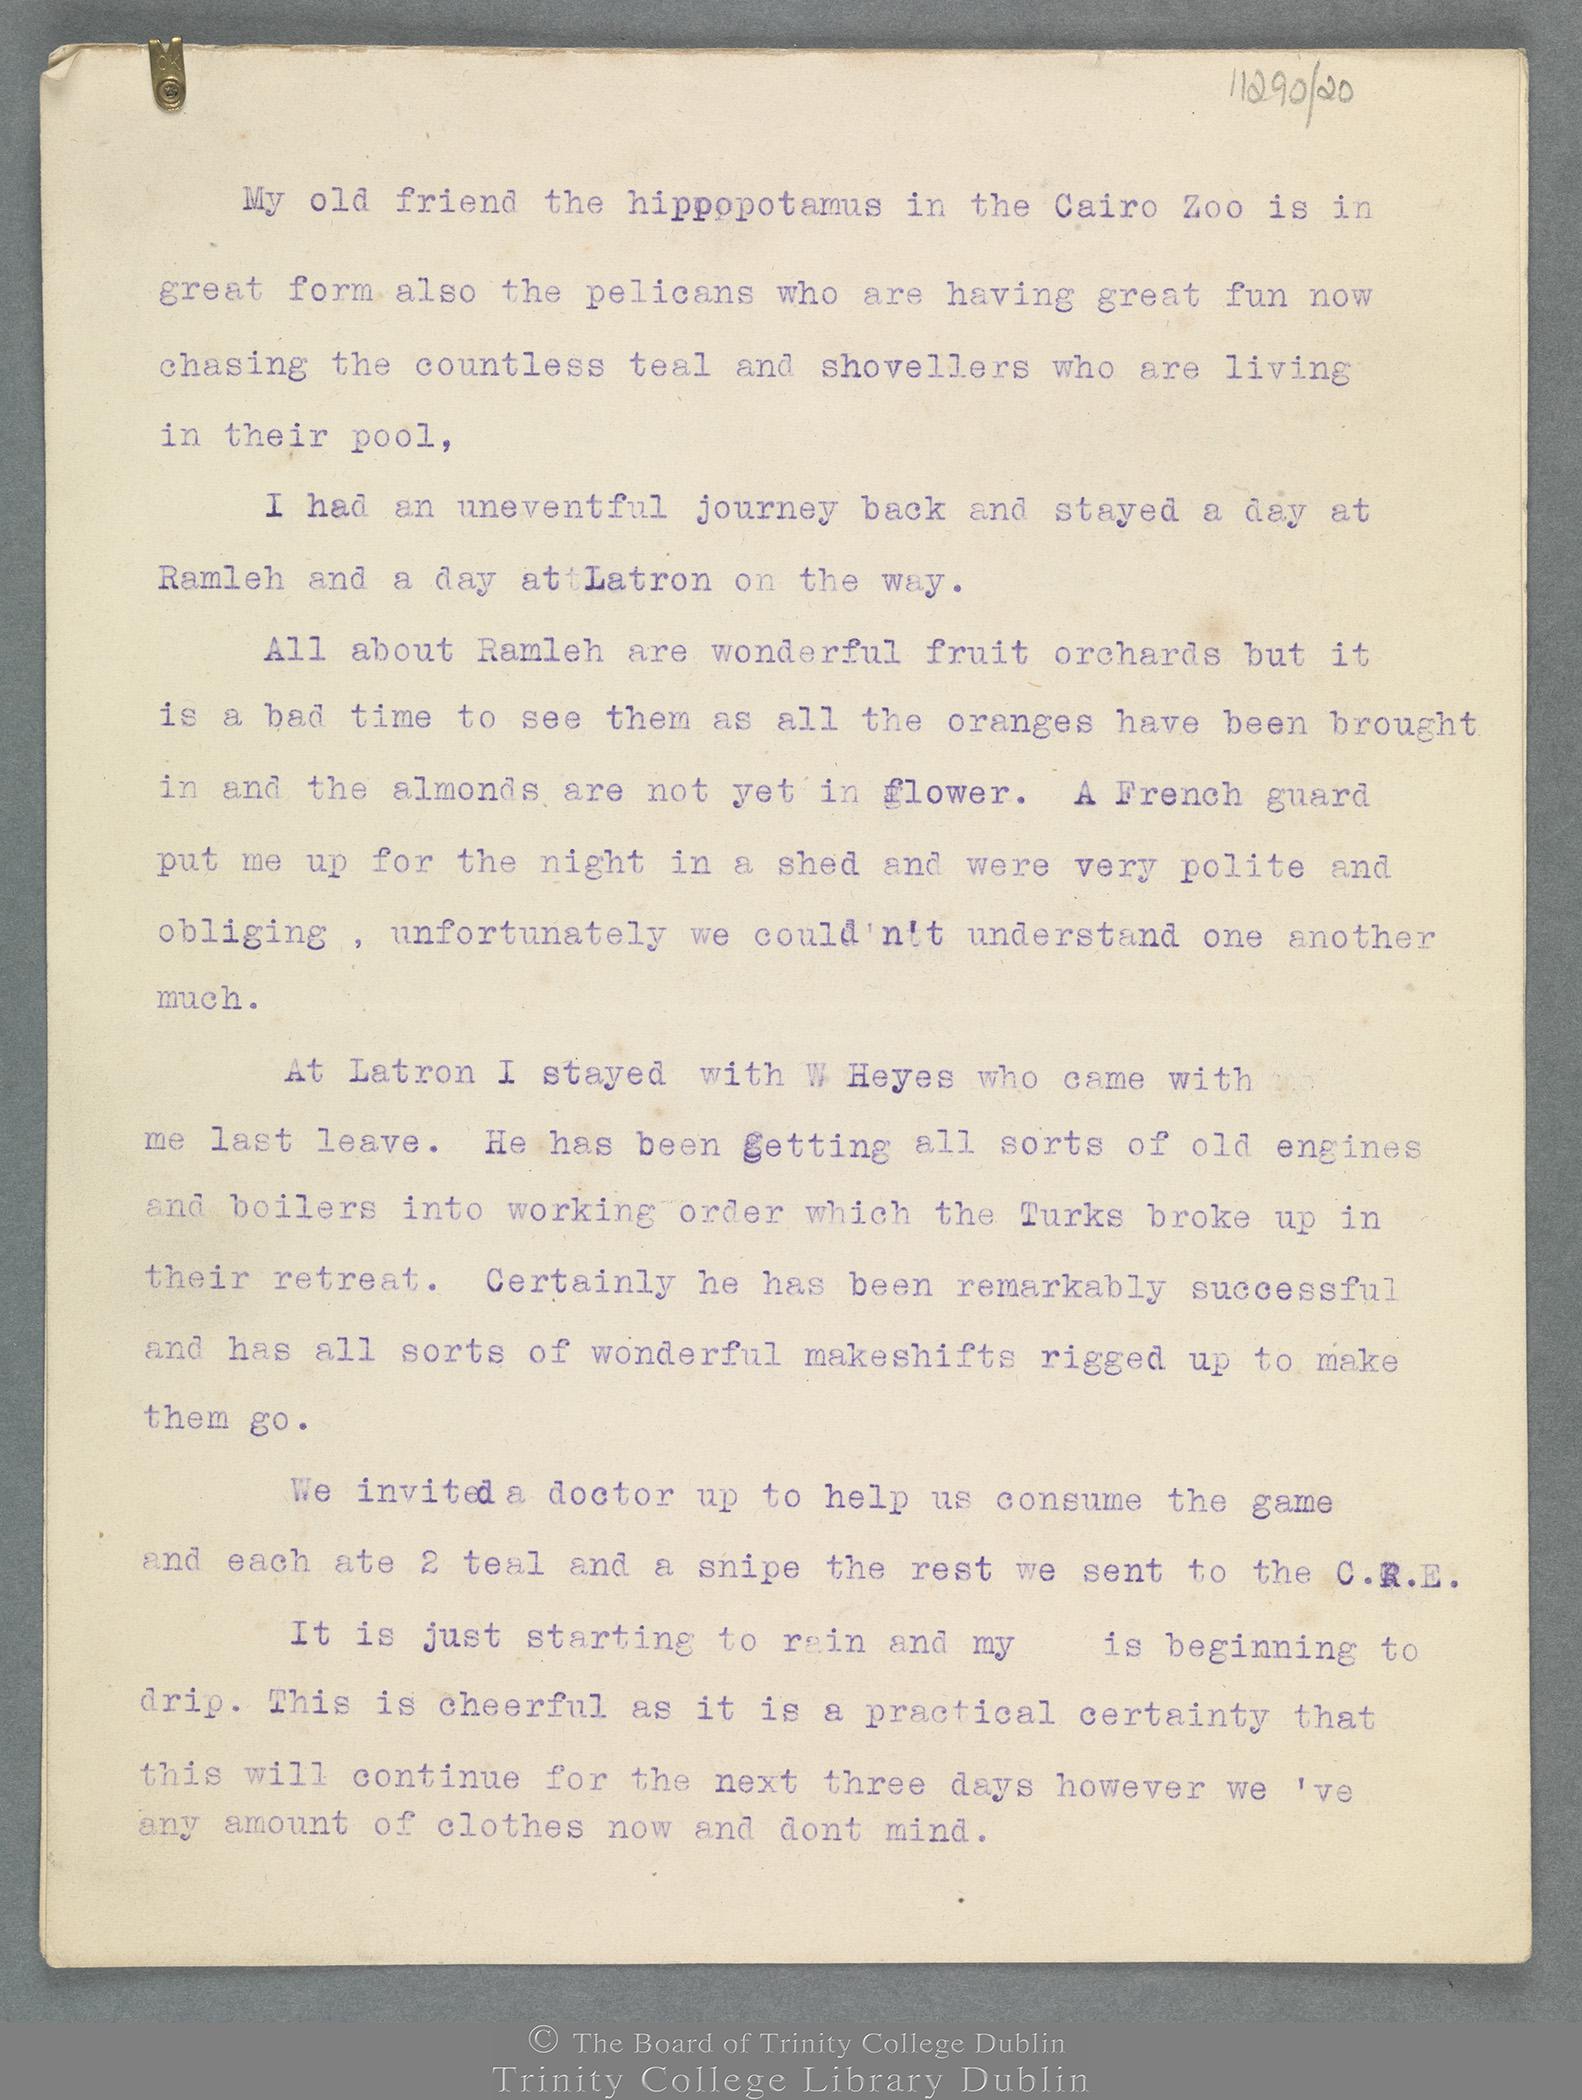 TCD MS 11290/20 folio 1 recto